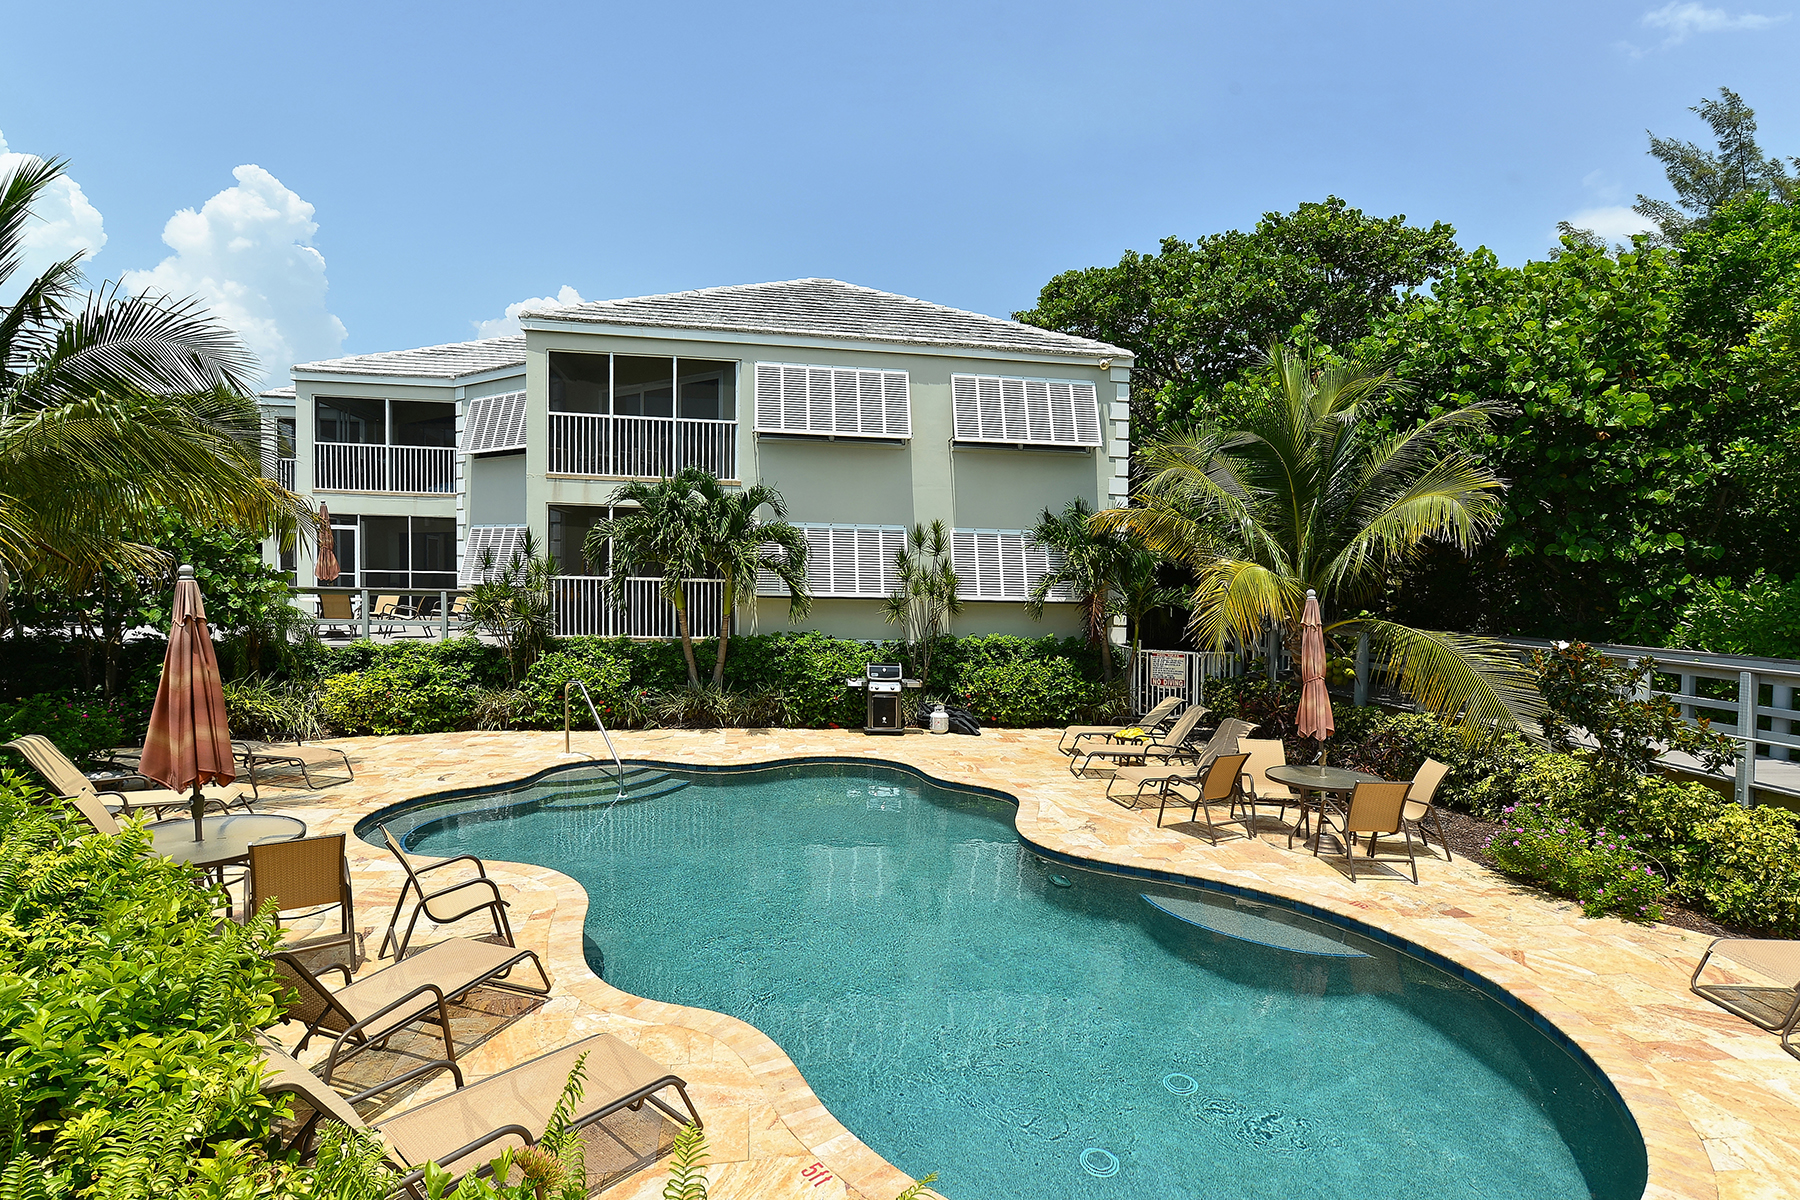 Condominium for Sale at LONGBOAT KEY 5621 Gulf Of Mexico Dr 102 Longboat Key, Florida, 34228 United States